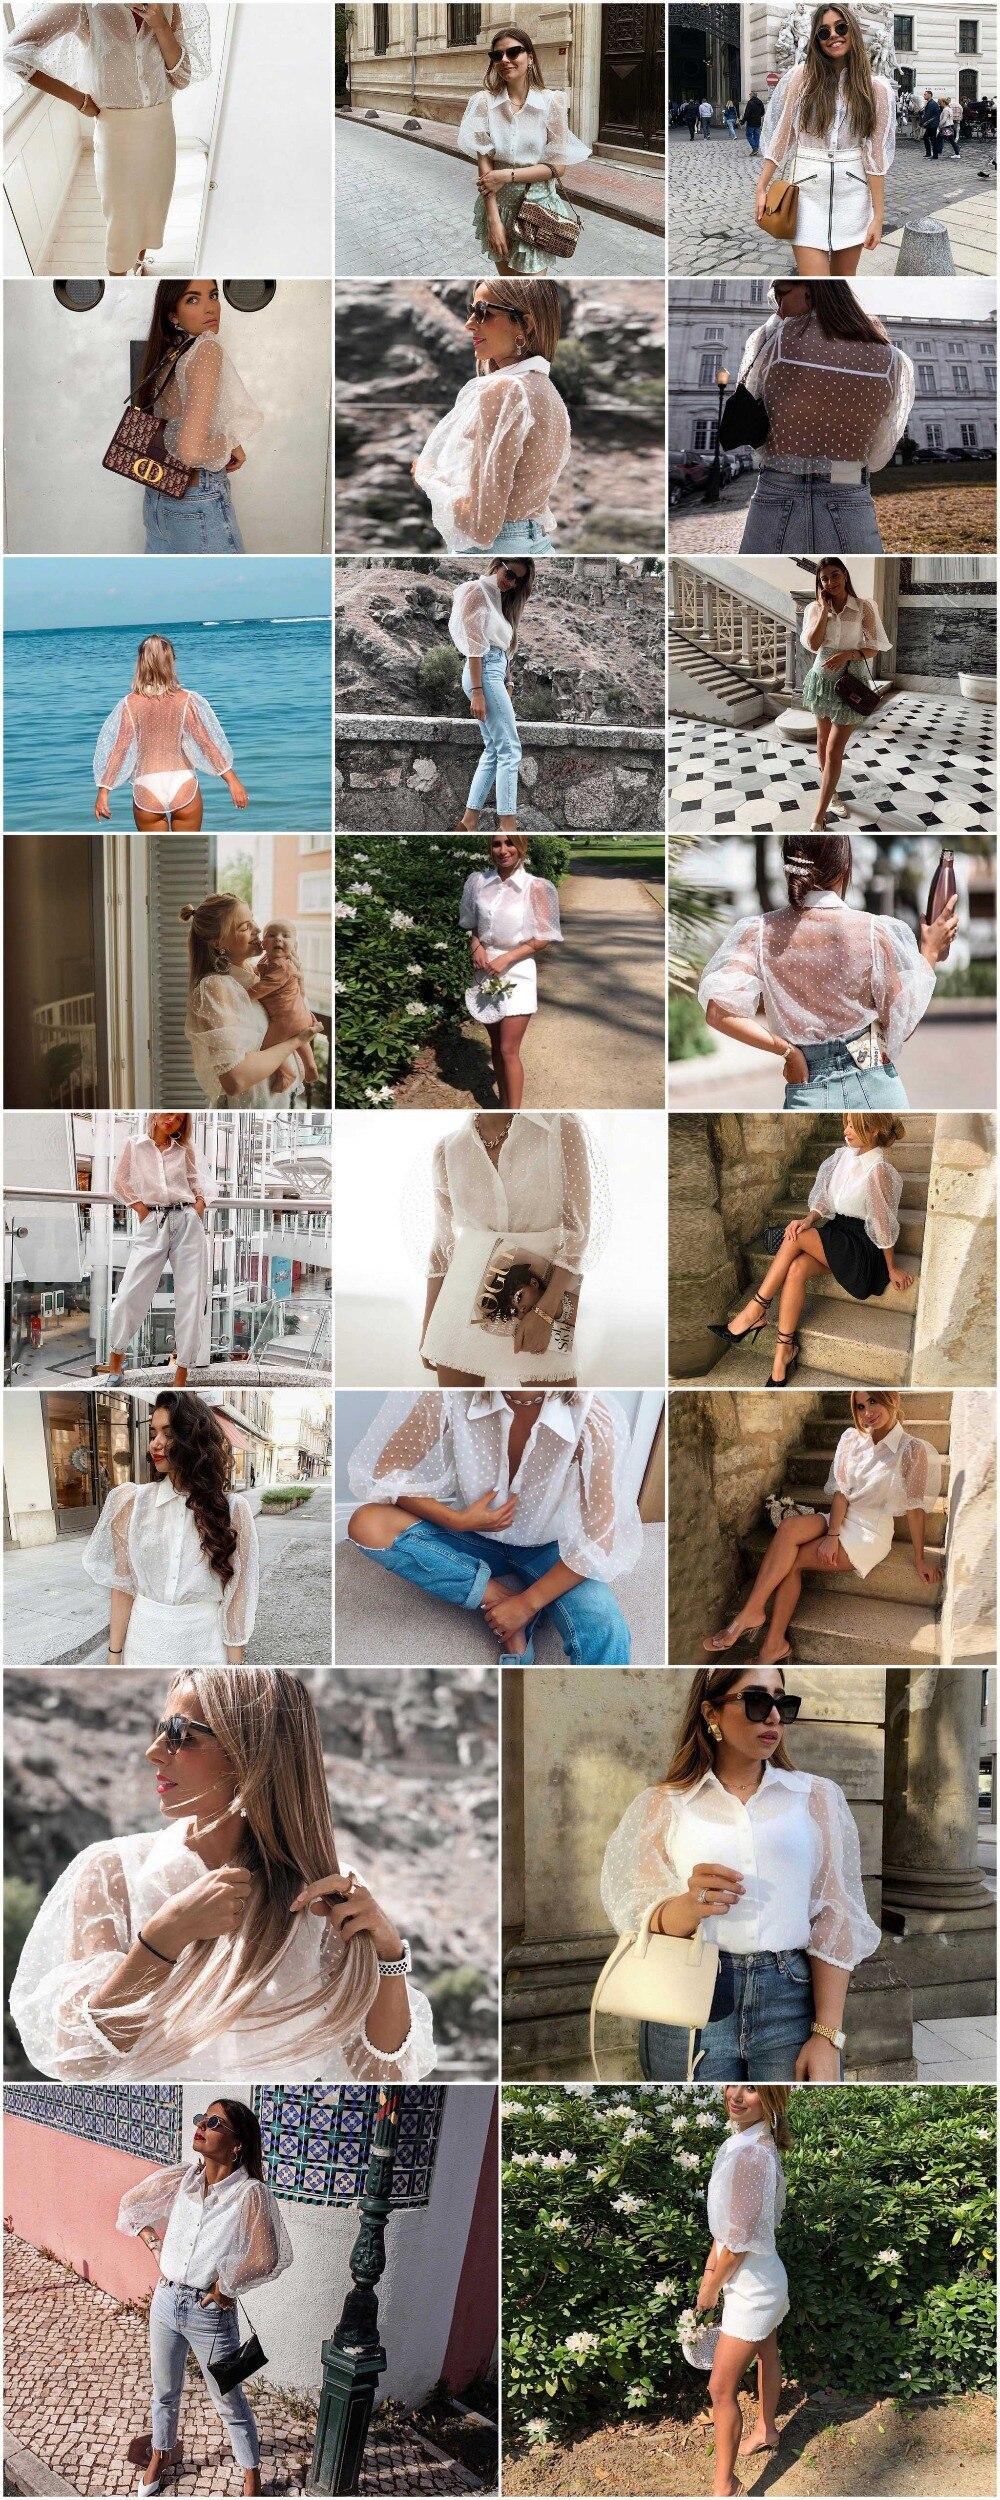 Fantoye 19 Summer Women Chiffon Blouse Shirt Sexy Transparent Mesh Beading Puff Sleeve Female office Shirts Lady Blusa Outfits 3